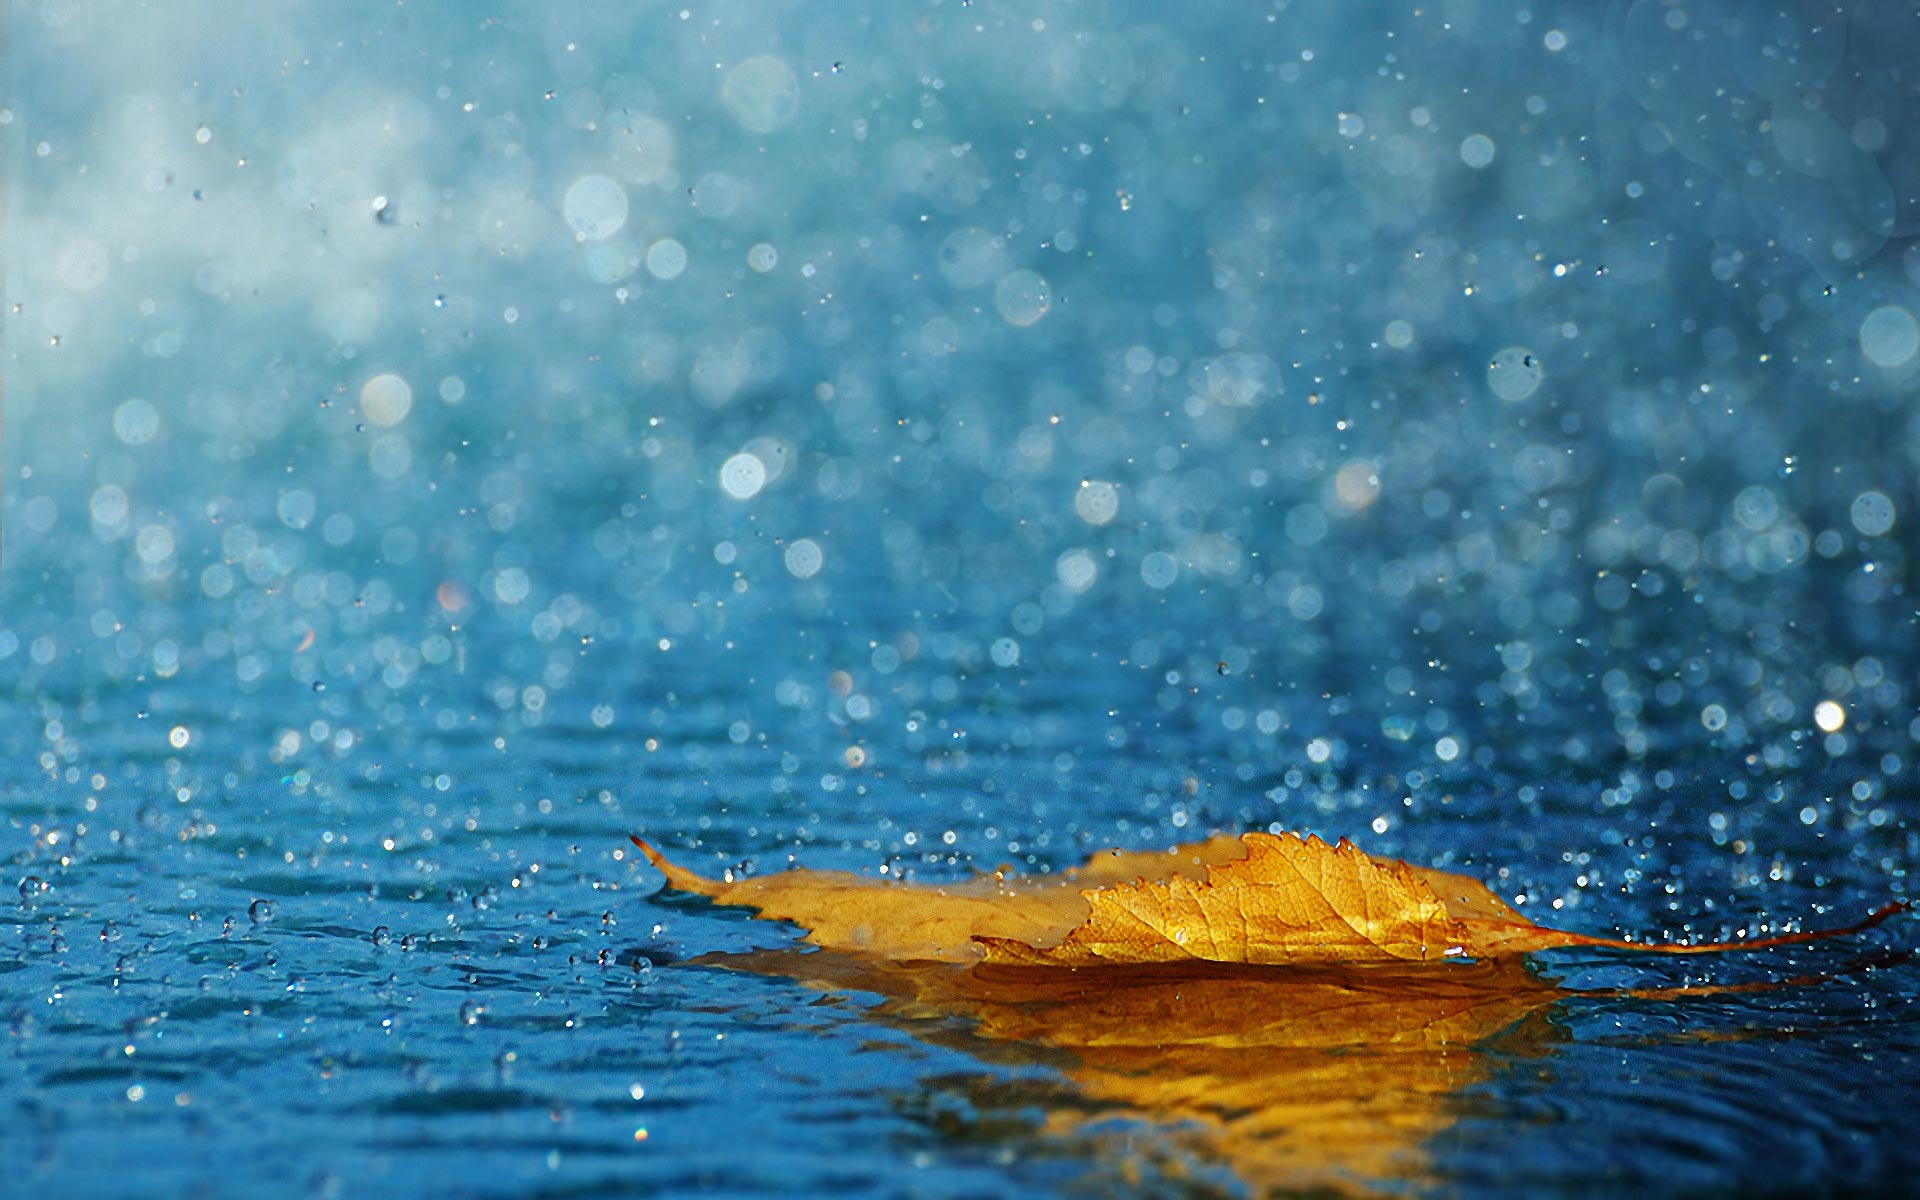 Depois-da-chuva-acabar-ir%C3%A1-sobrar-o-cheiro-da-terra-e-o-sil%C3%AAncio-triste-proveniente-da-chuva-http-wallpaper-wpc5804003